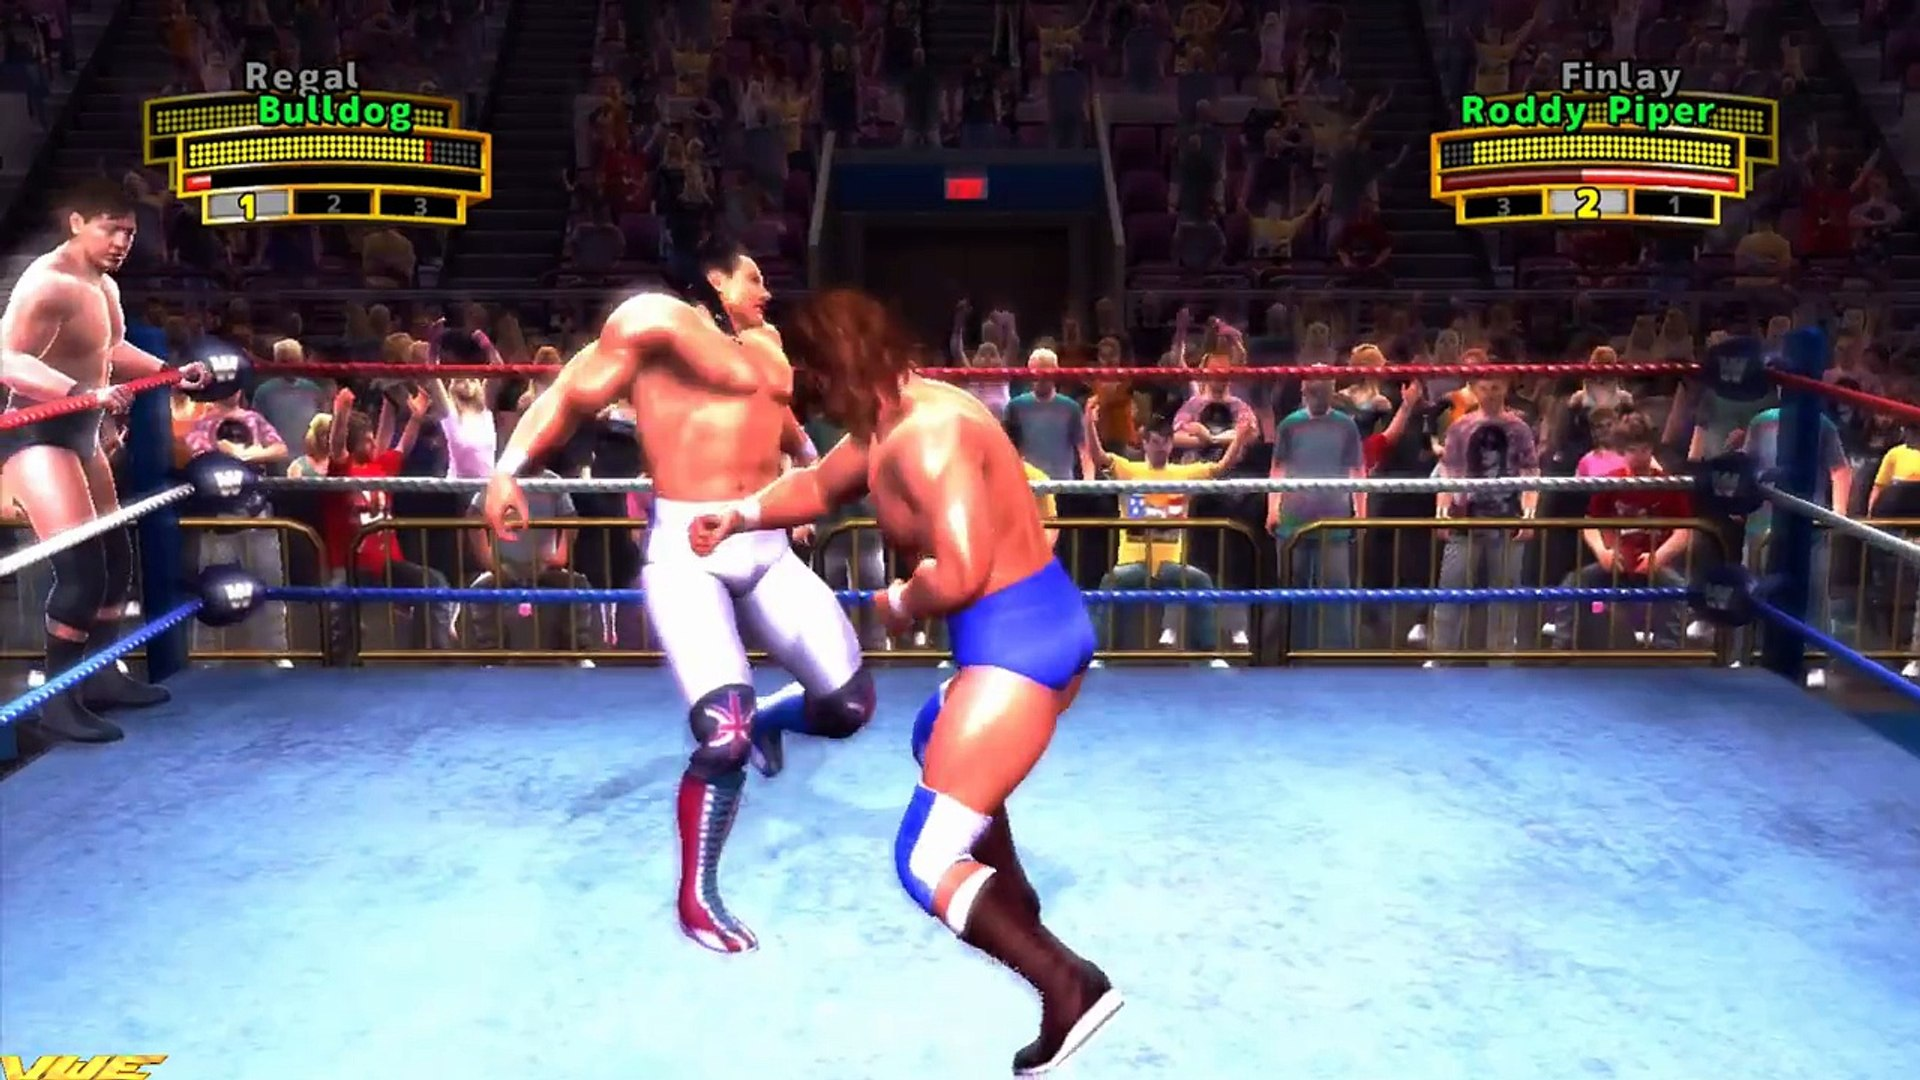 WWE Legends of Wrestlemania - British Bulldog & William Regal Vs. Rowdy Roddy Piper & Finlay